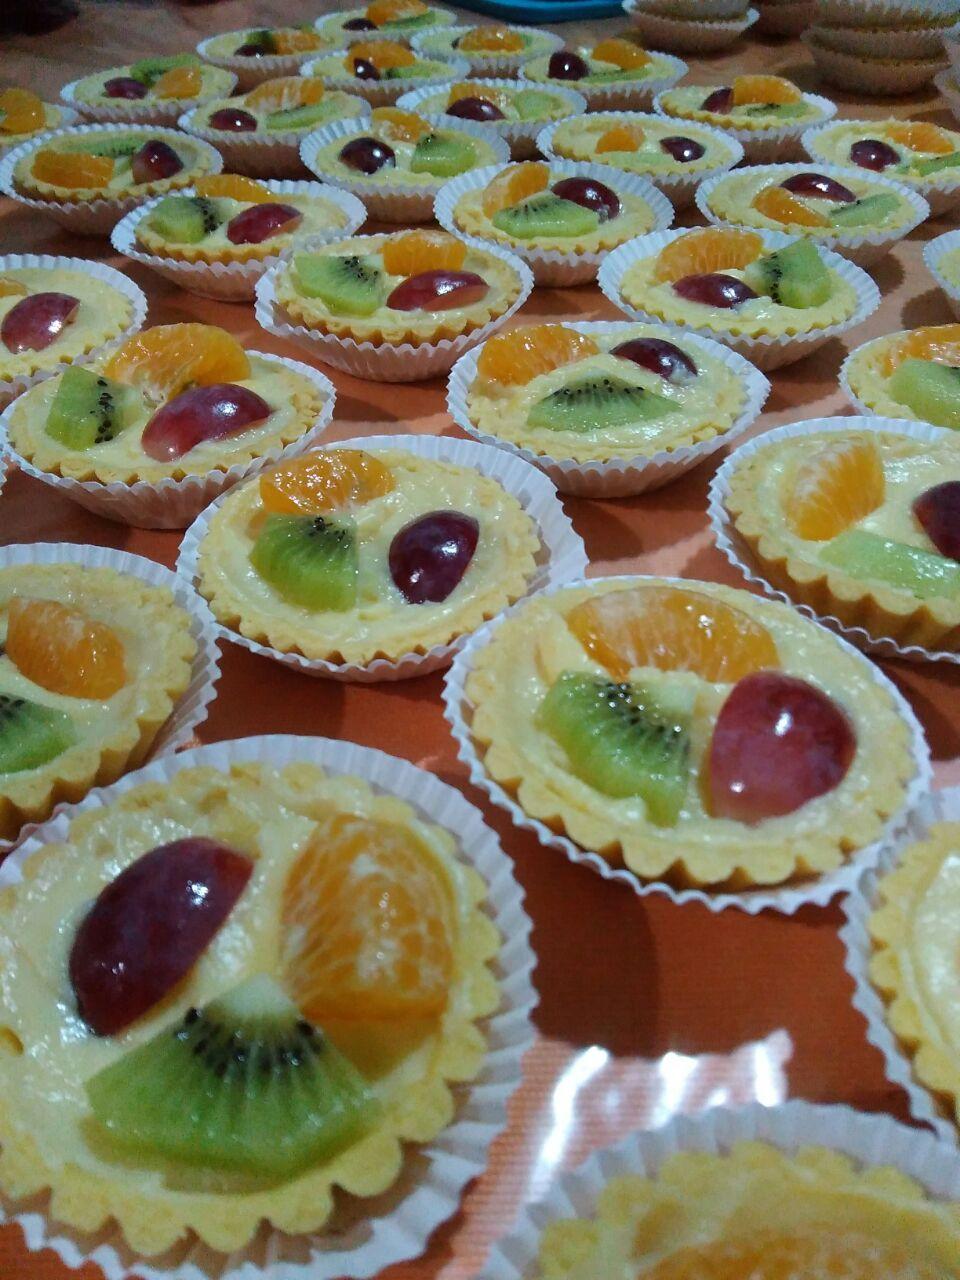 Pie Buah Snack Box Bandar Lampung